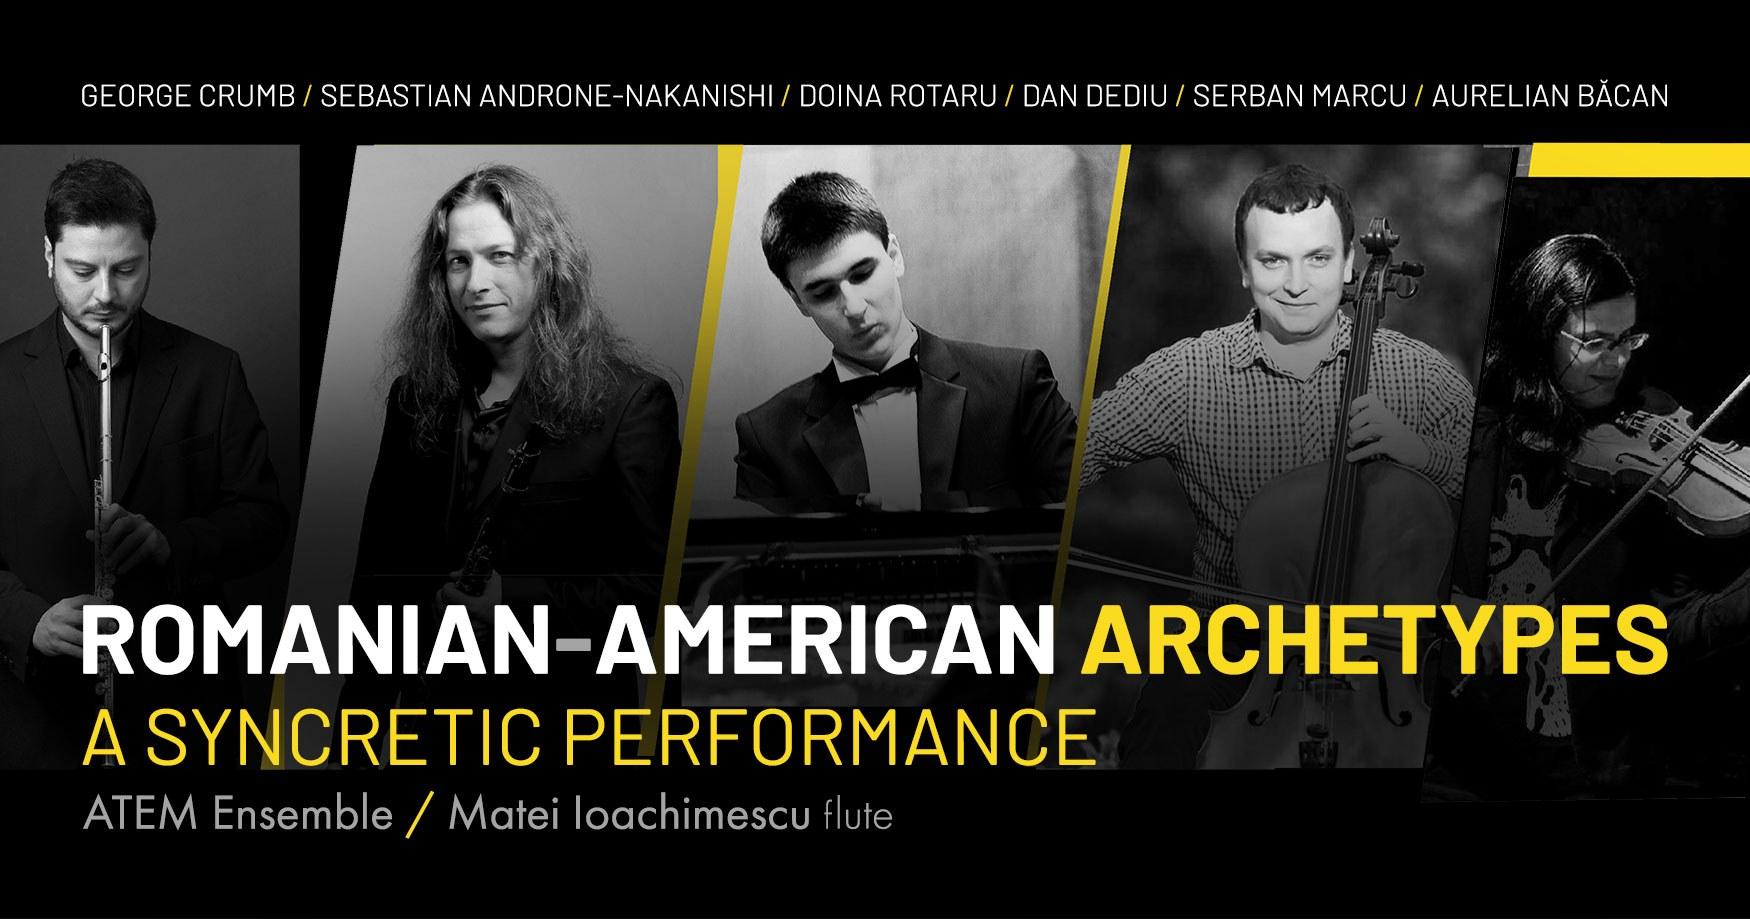 Matei & ATEM Ensemble